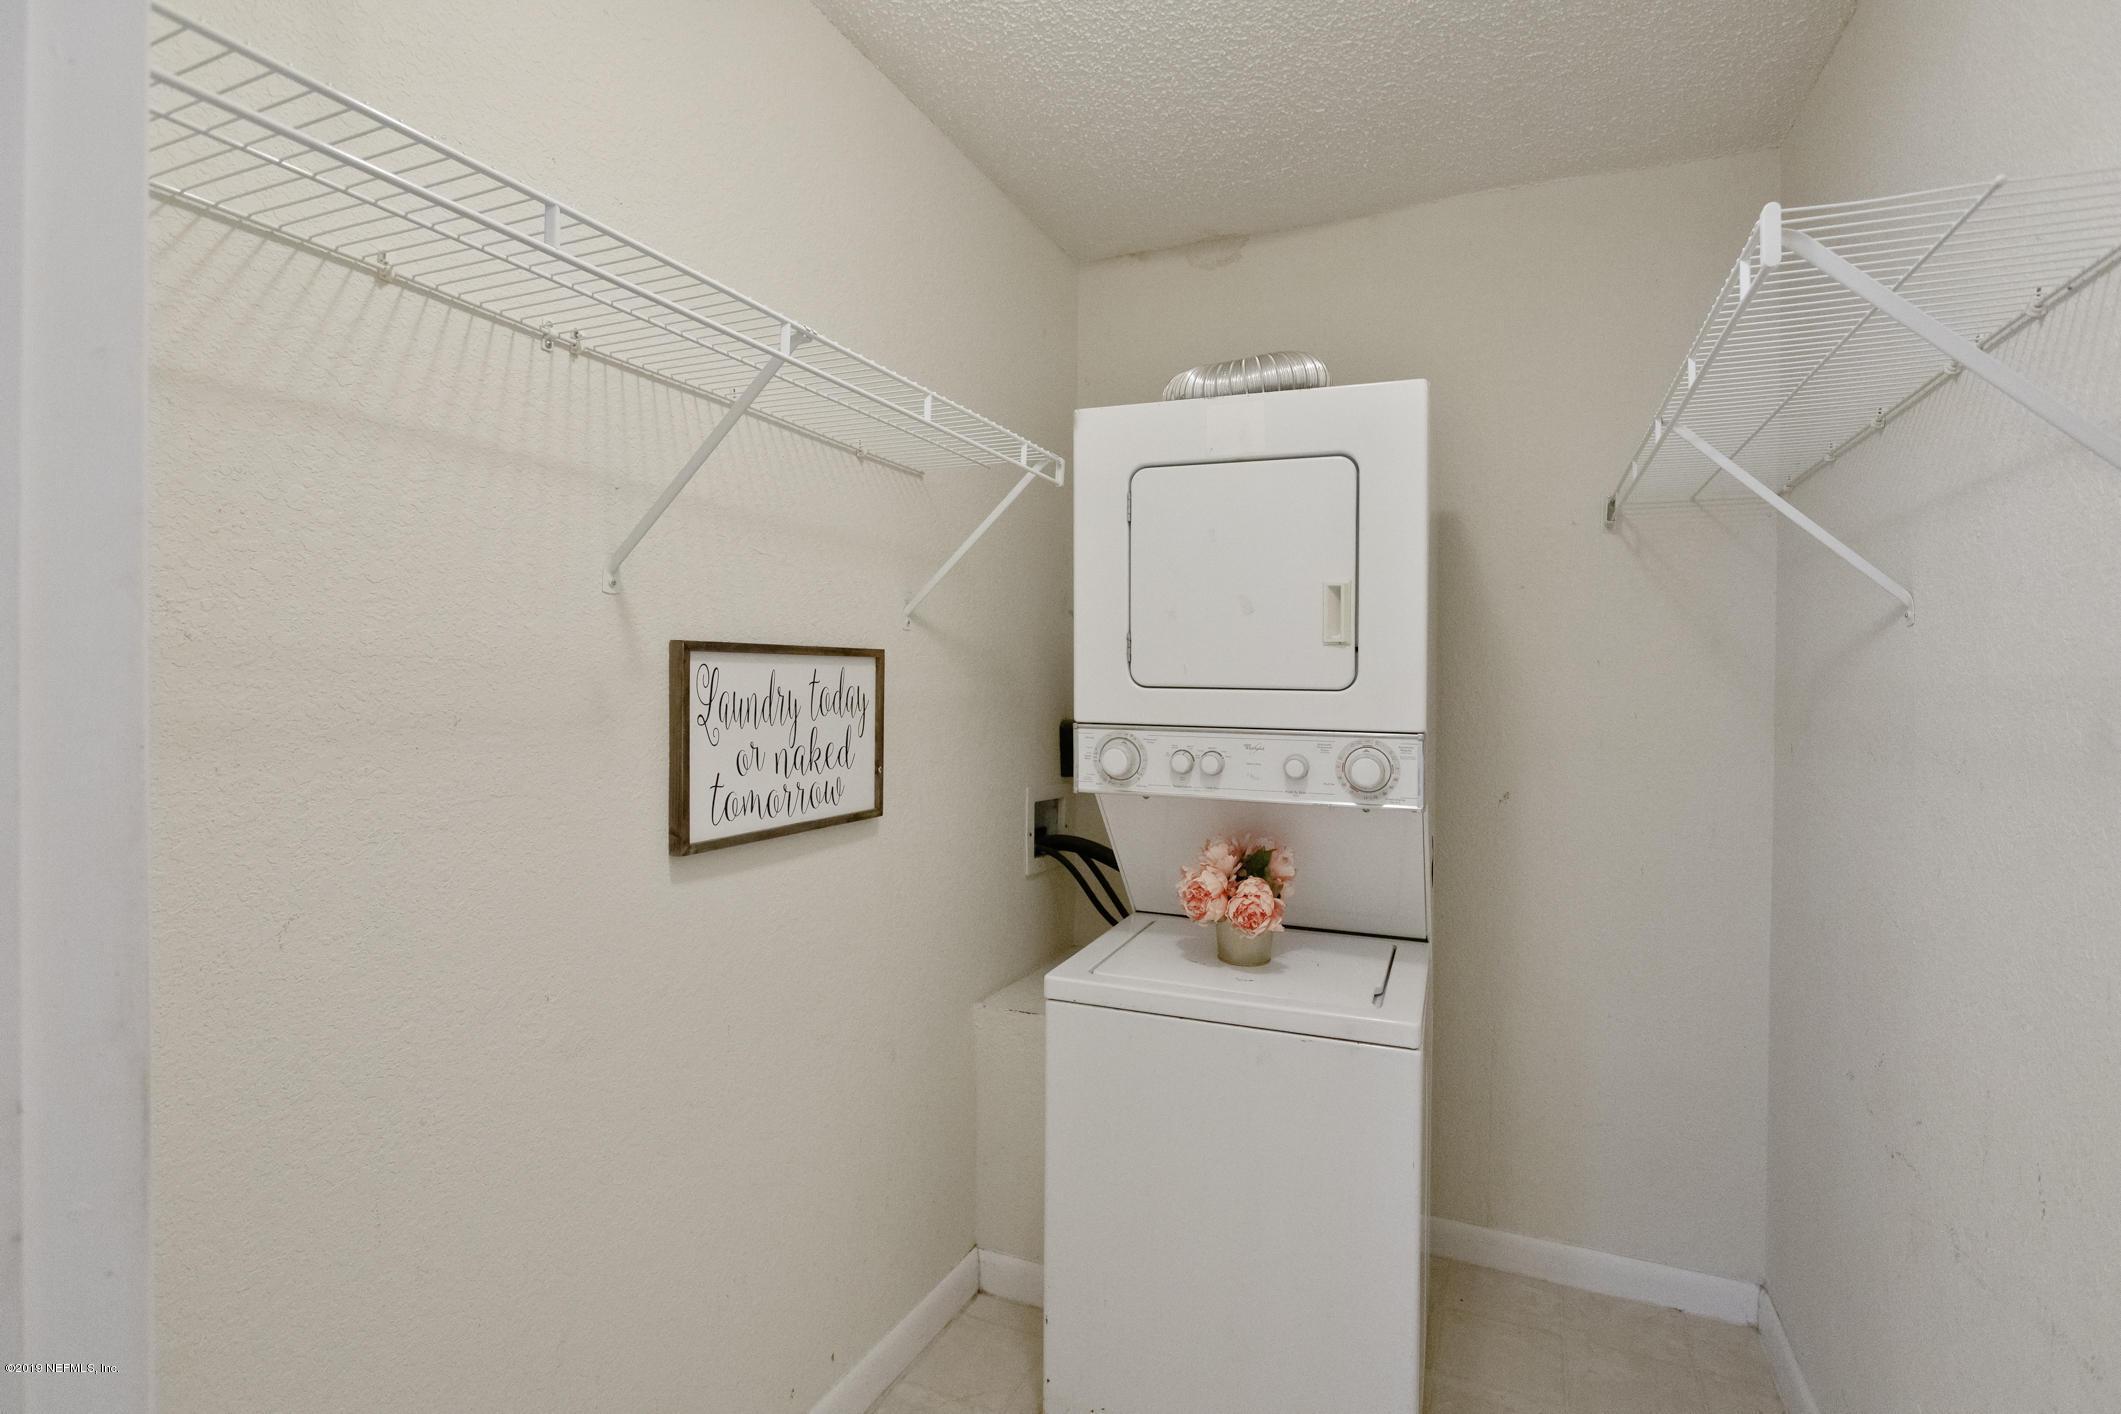 5811 ATLANTIC, JACKSONVILLE, FLORIDA 32207, 2 Bedrooms Bedrooms, ,2 BathroomsBathrooms,Residential - condos/townhomes,For sale,ATLANTIC,974147